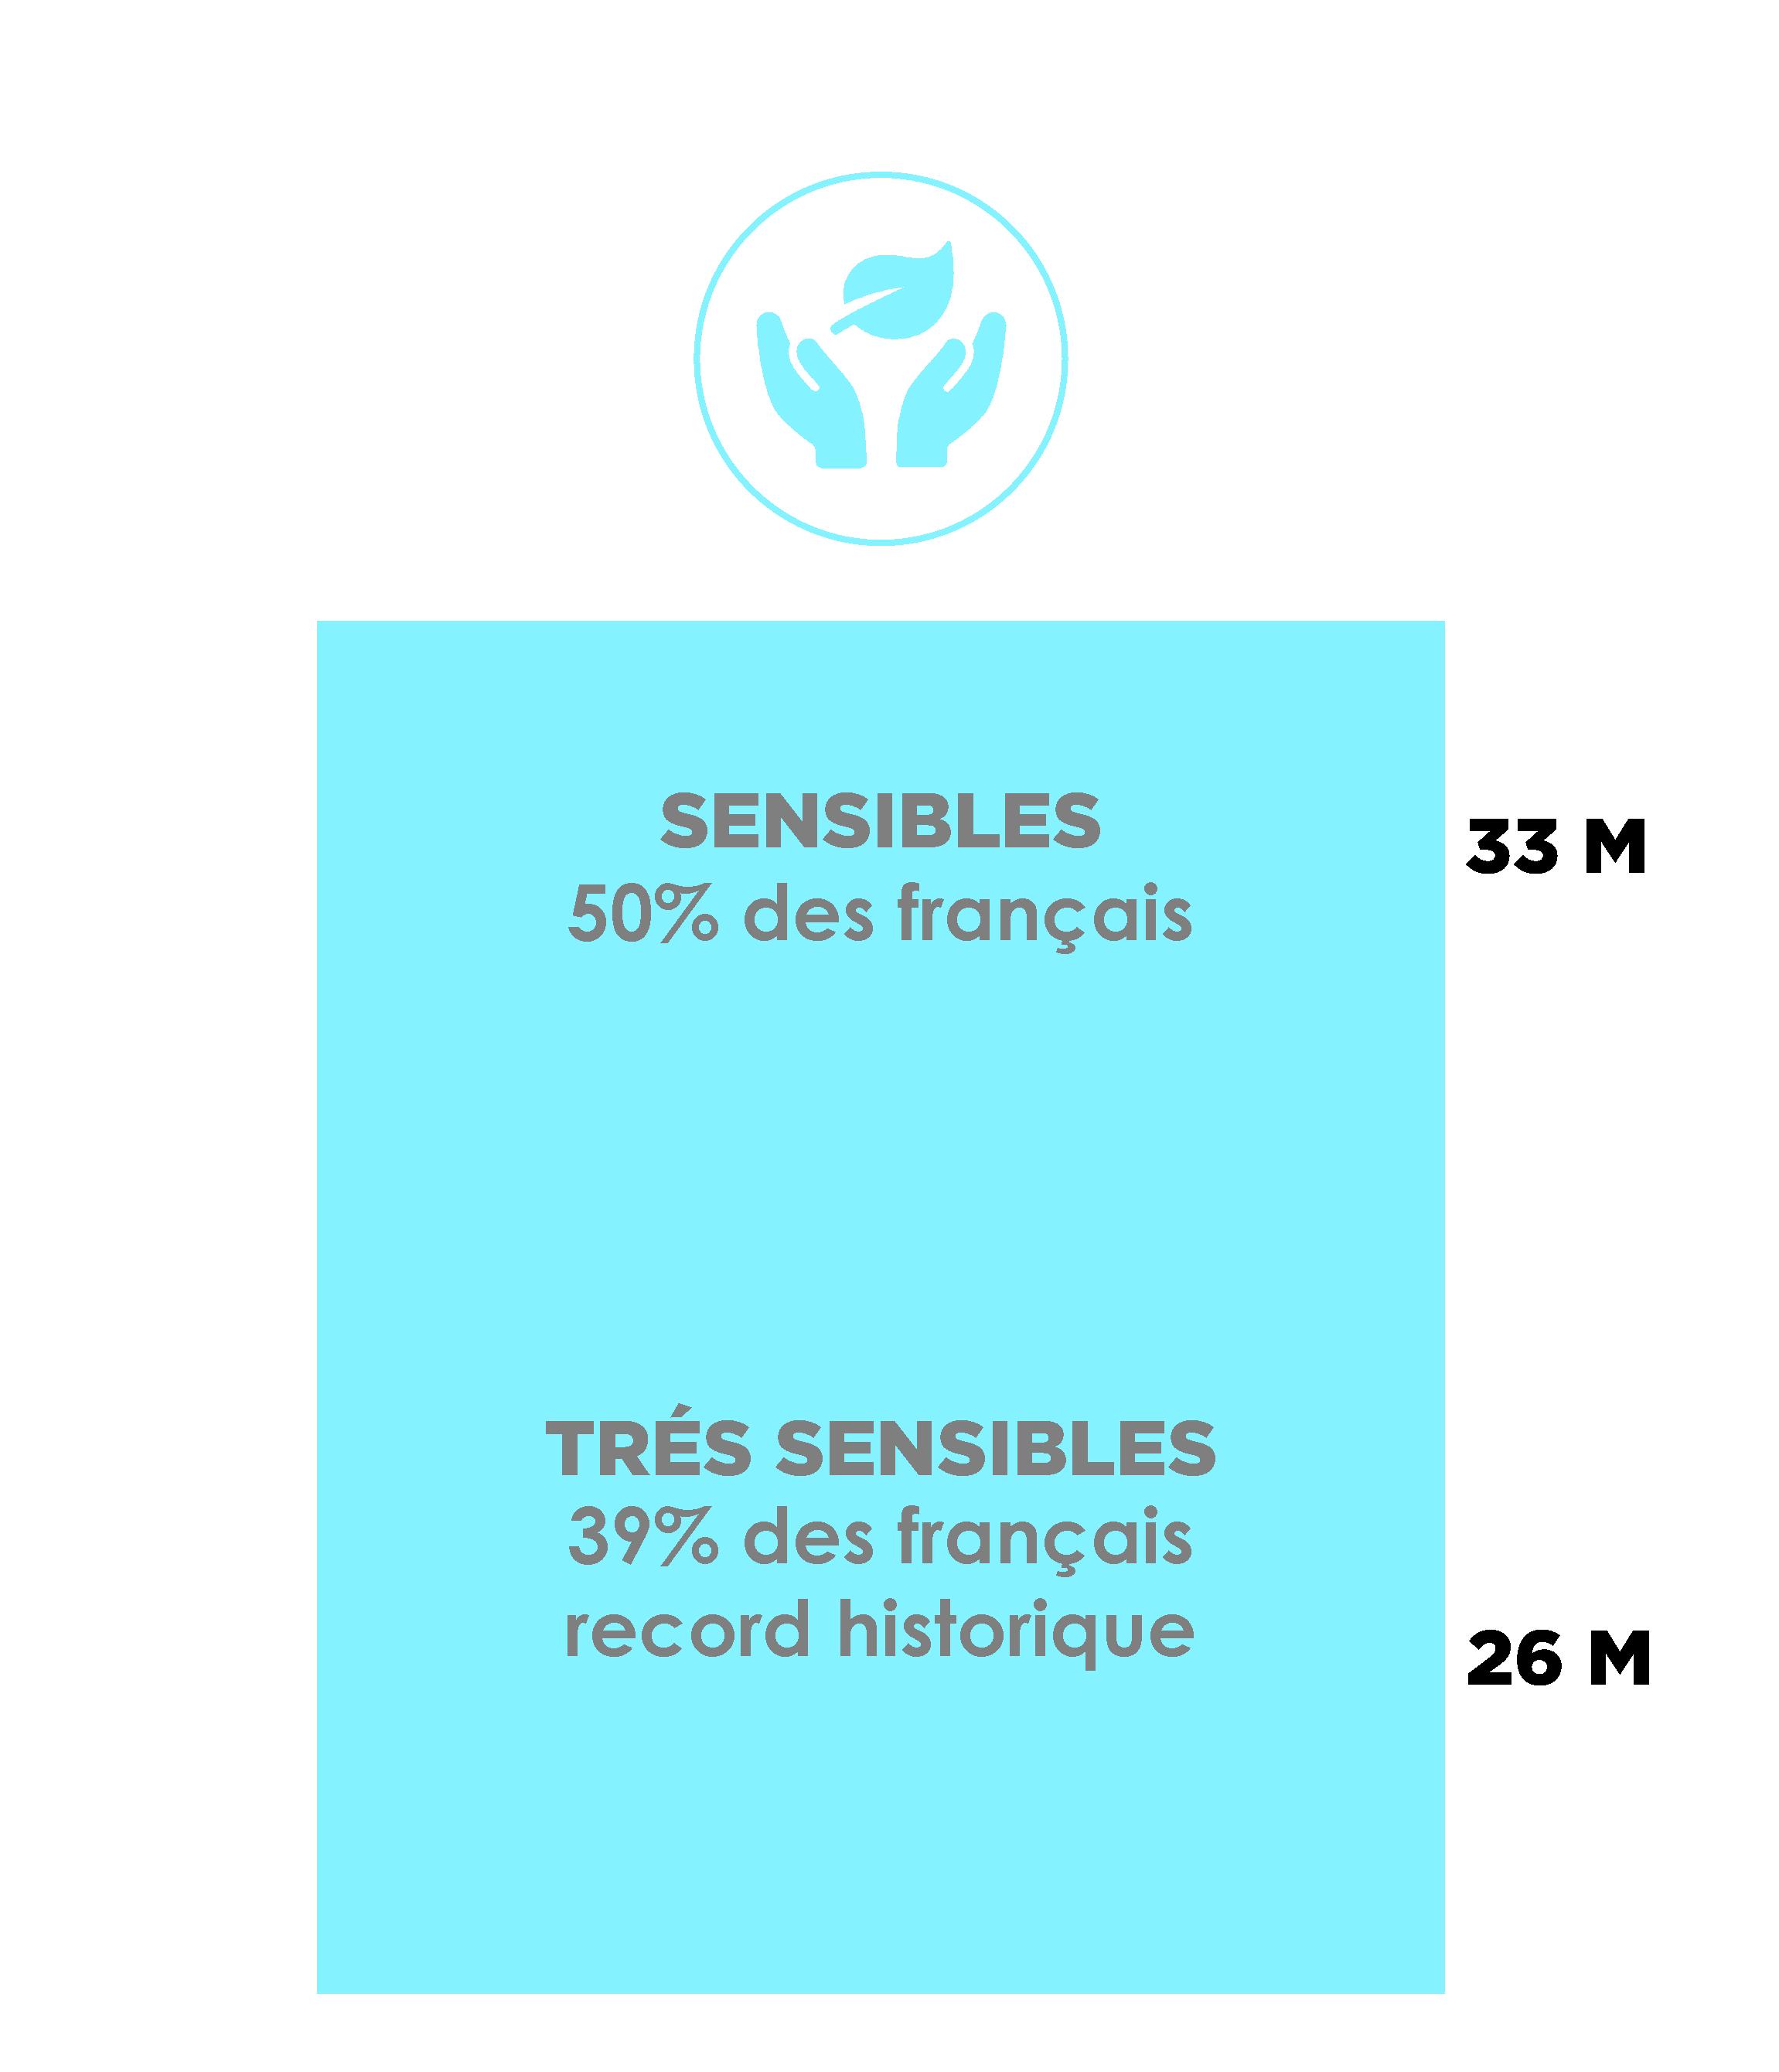 chiffres environnement